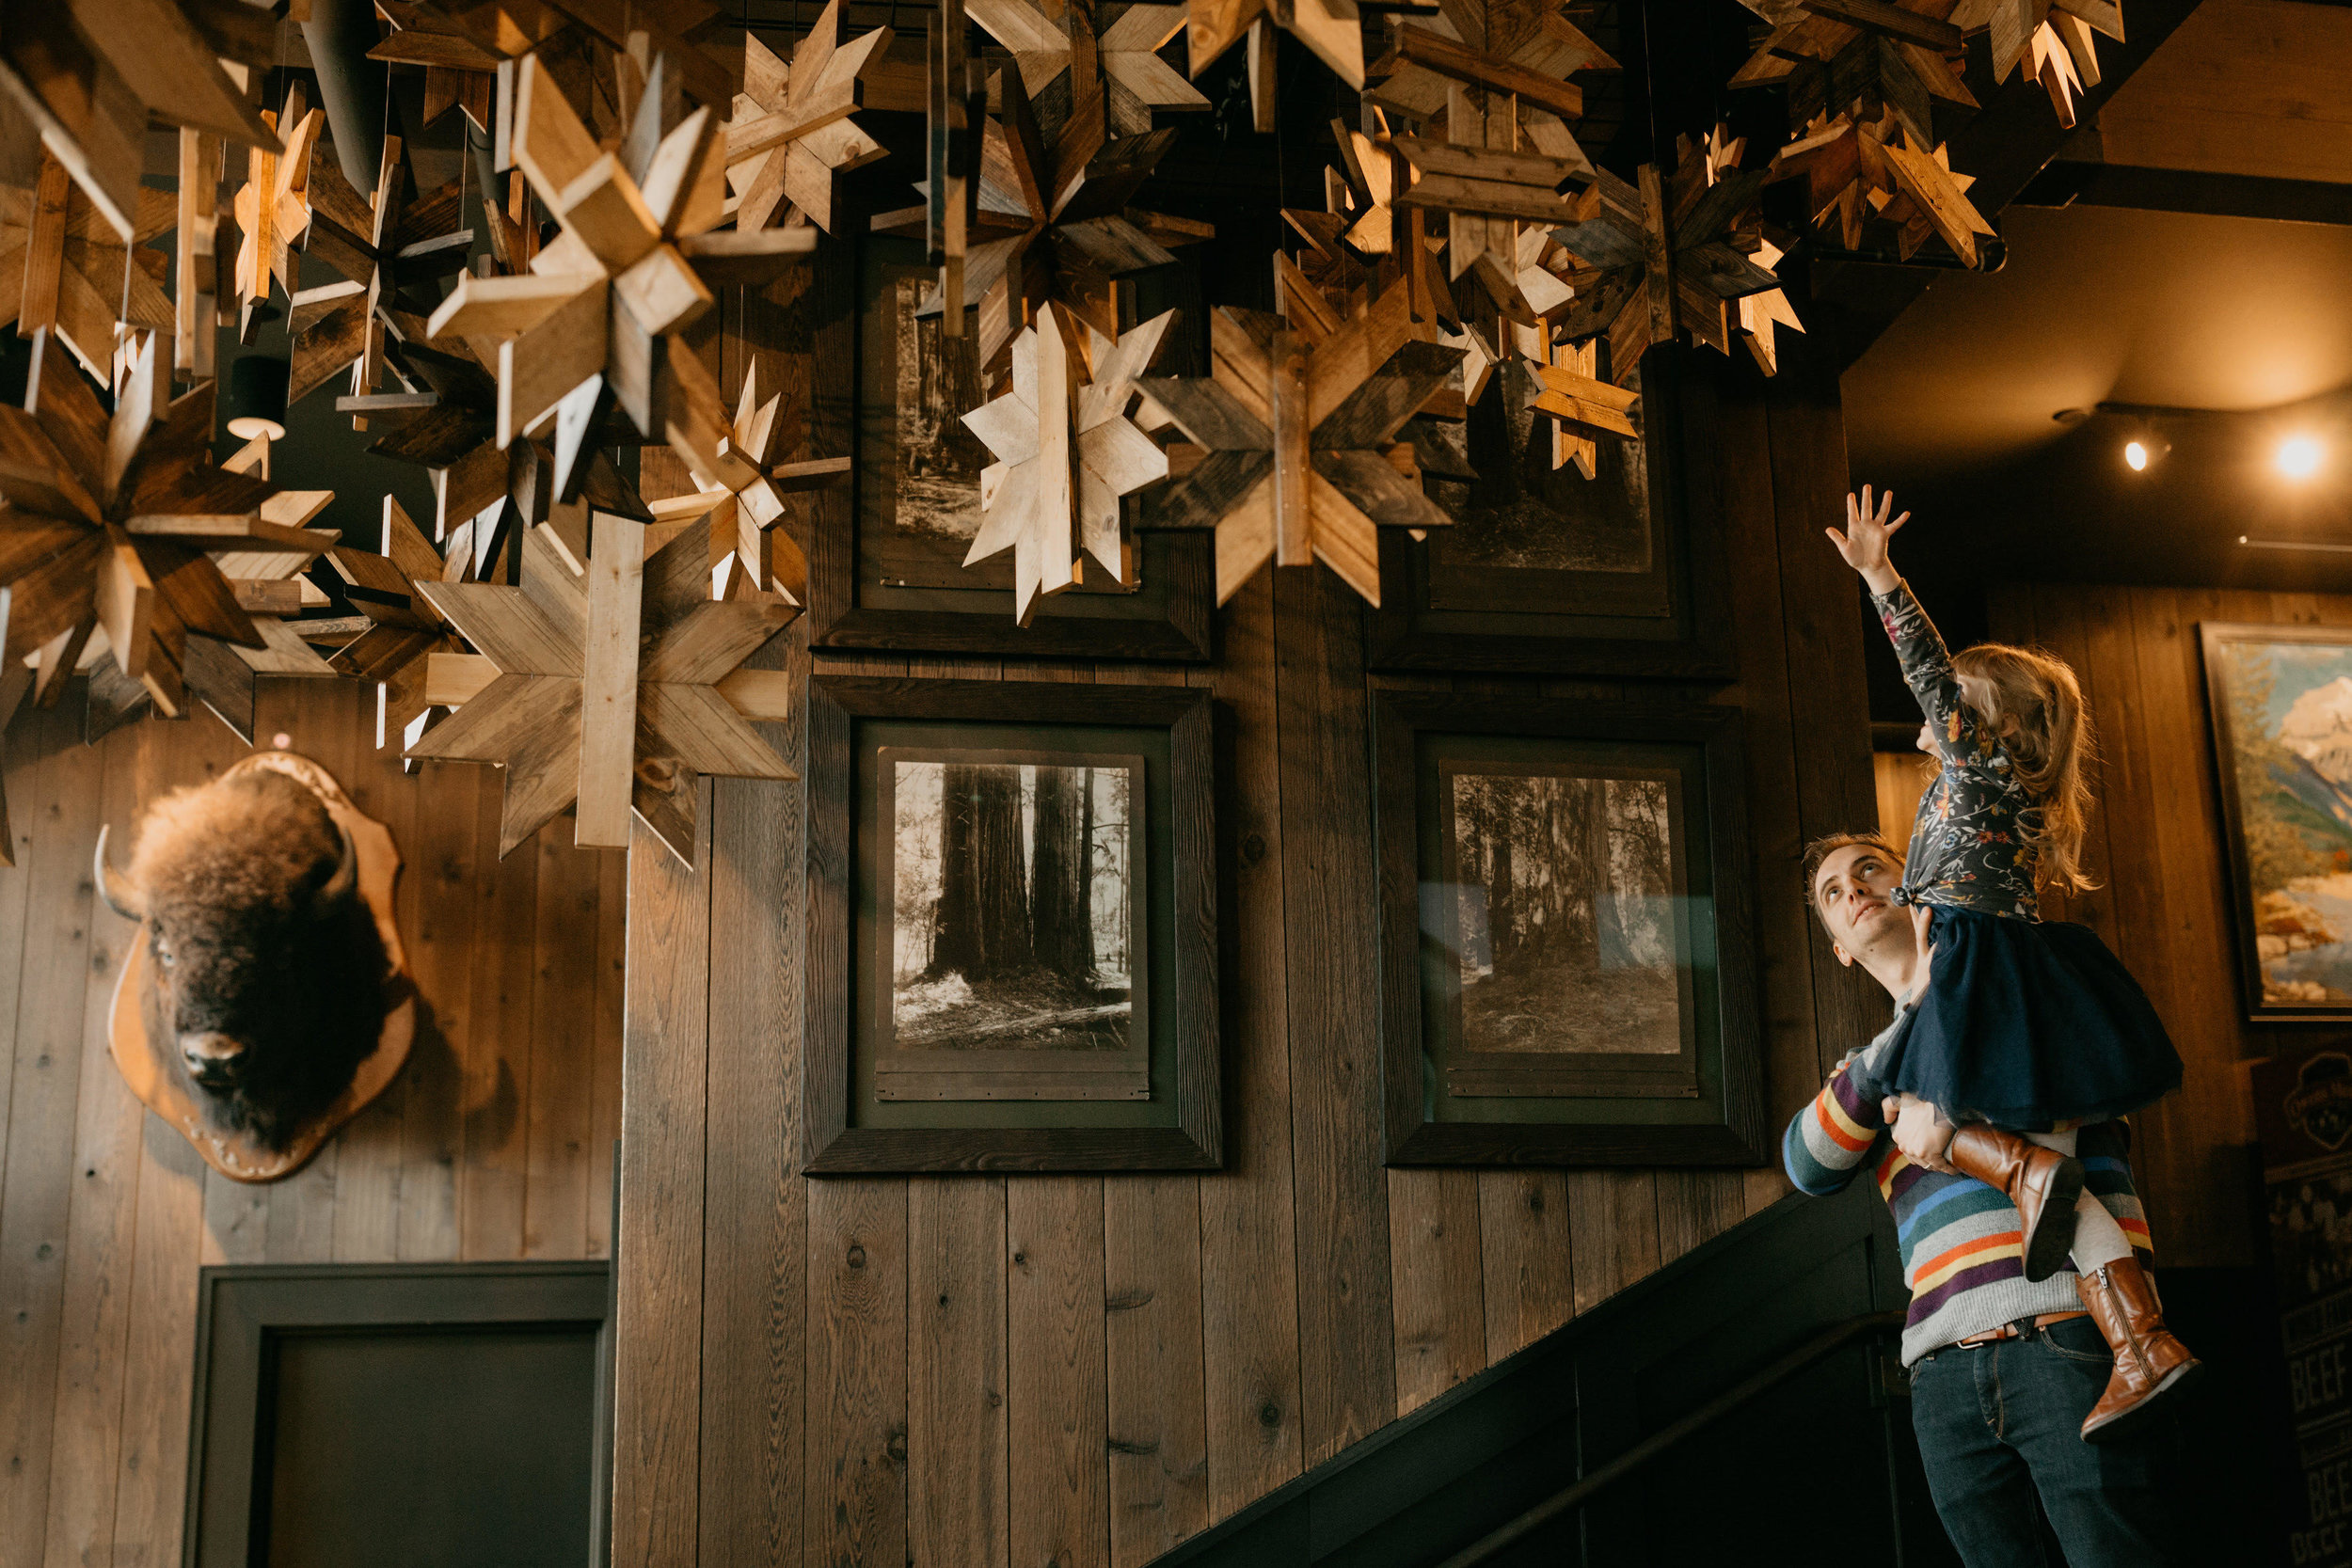 JennyLinquist snowflakes.jpg